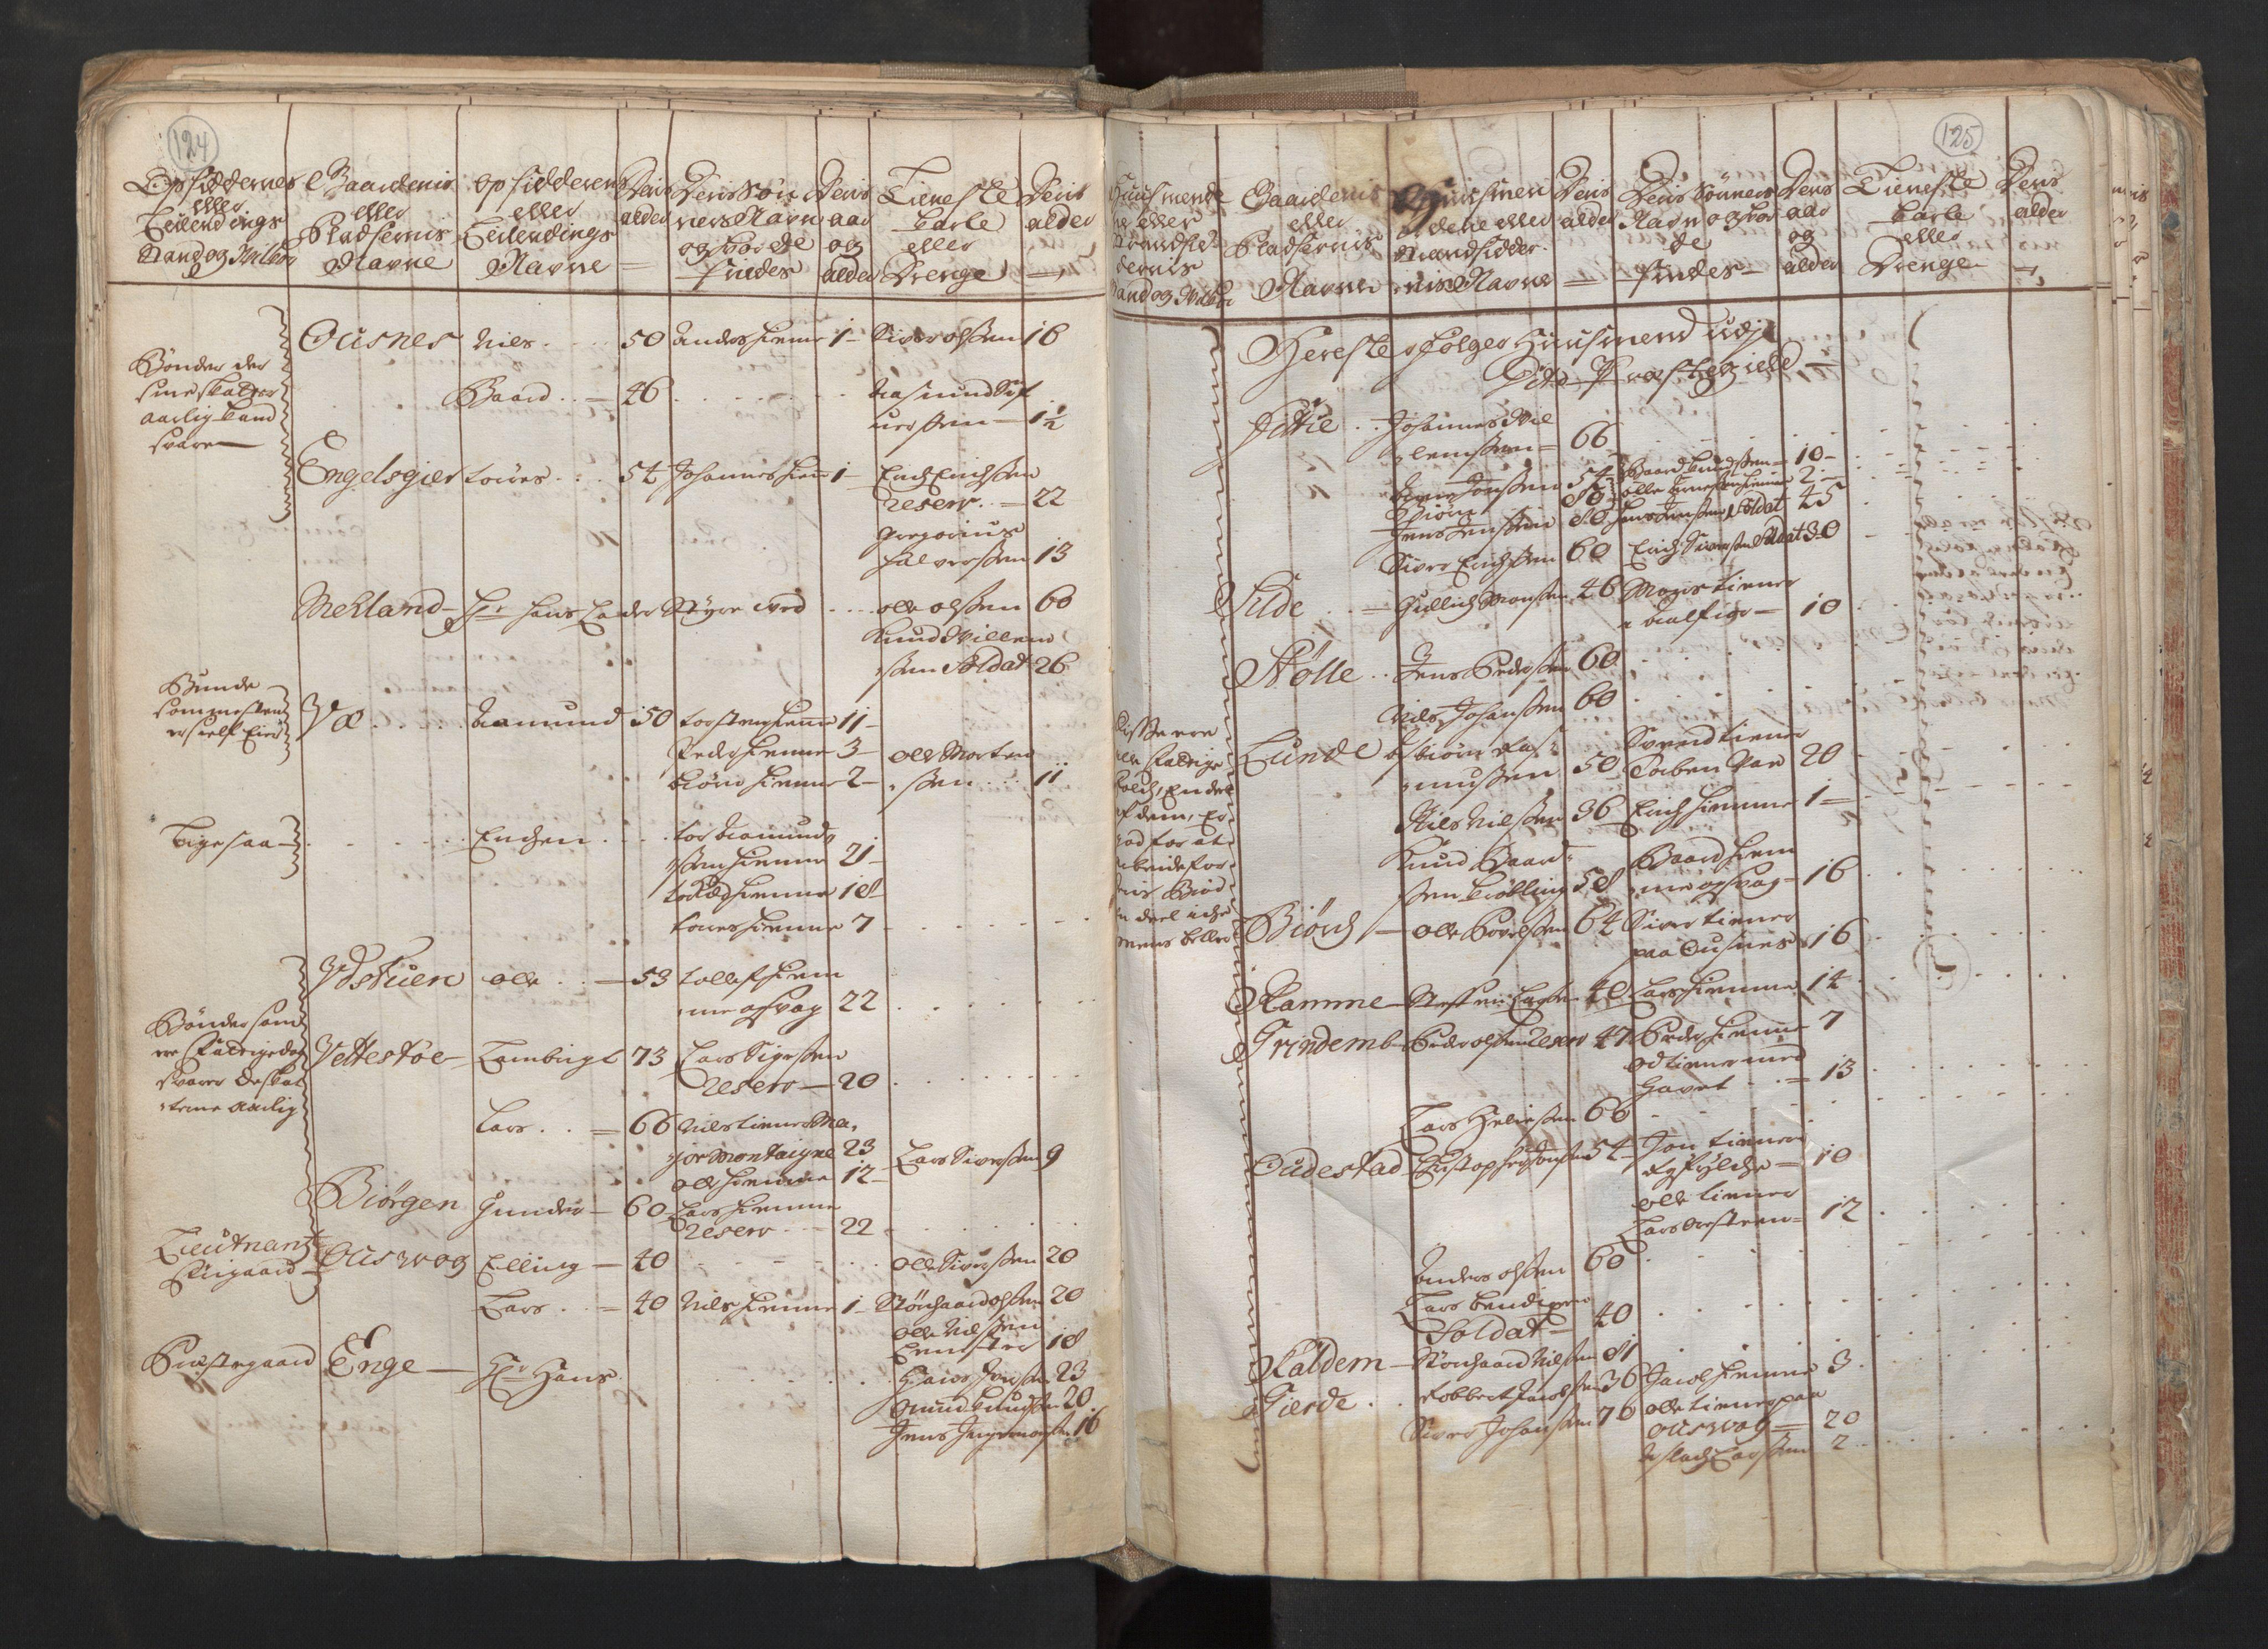 RA, Manntallet 1701, nr. 6: Sunnhordland fogderi og Hardanger fogderi, 1701, s. 124-125